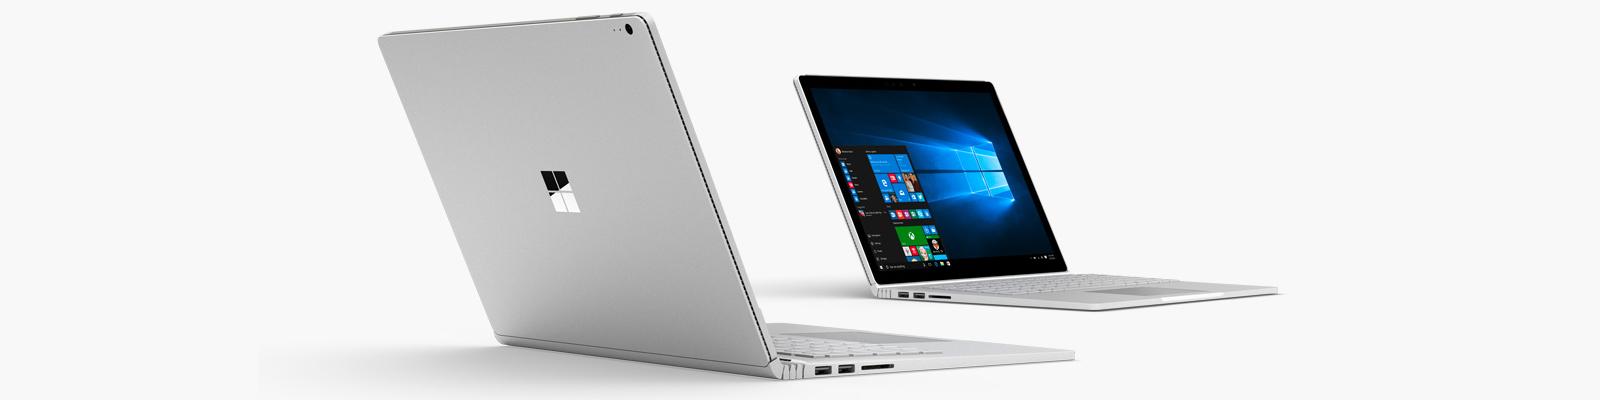 en INTL PDP Surface Book 2016 Refresh CR9 00001 C1 desktop